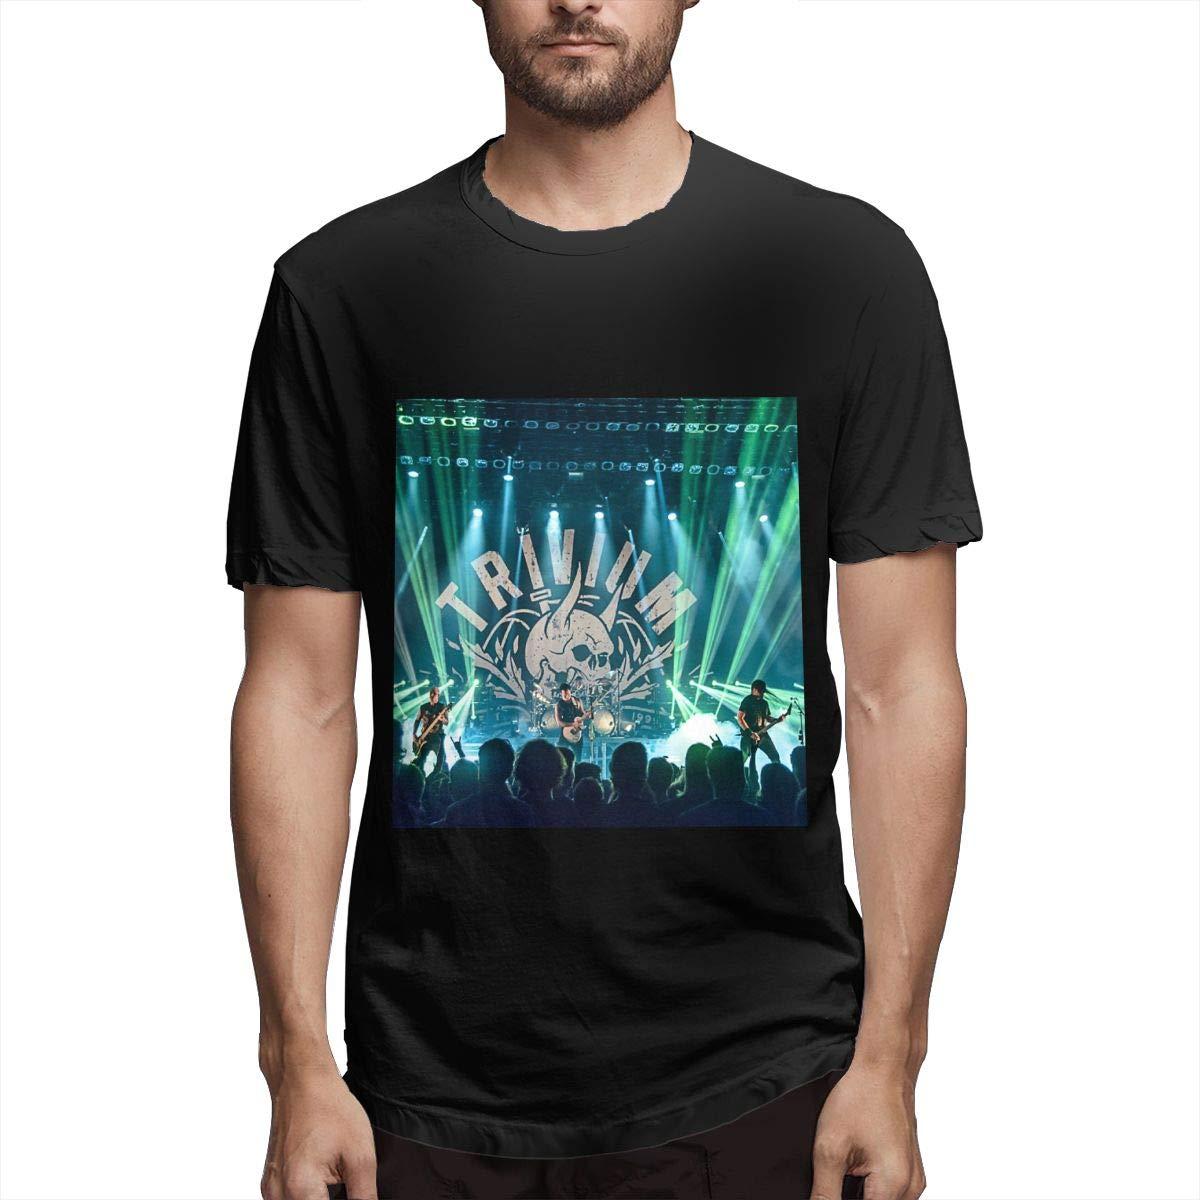 Lihehen Trivium Retro Printing Round Neck Tees Shirts